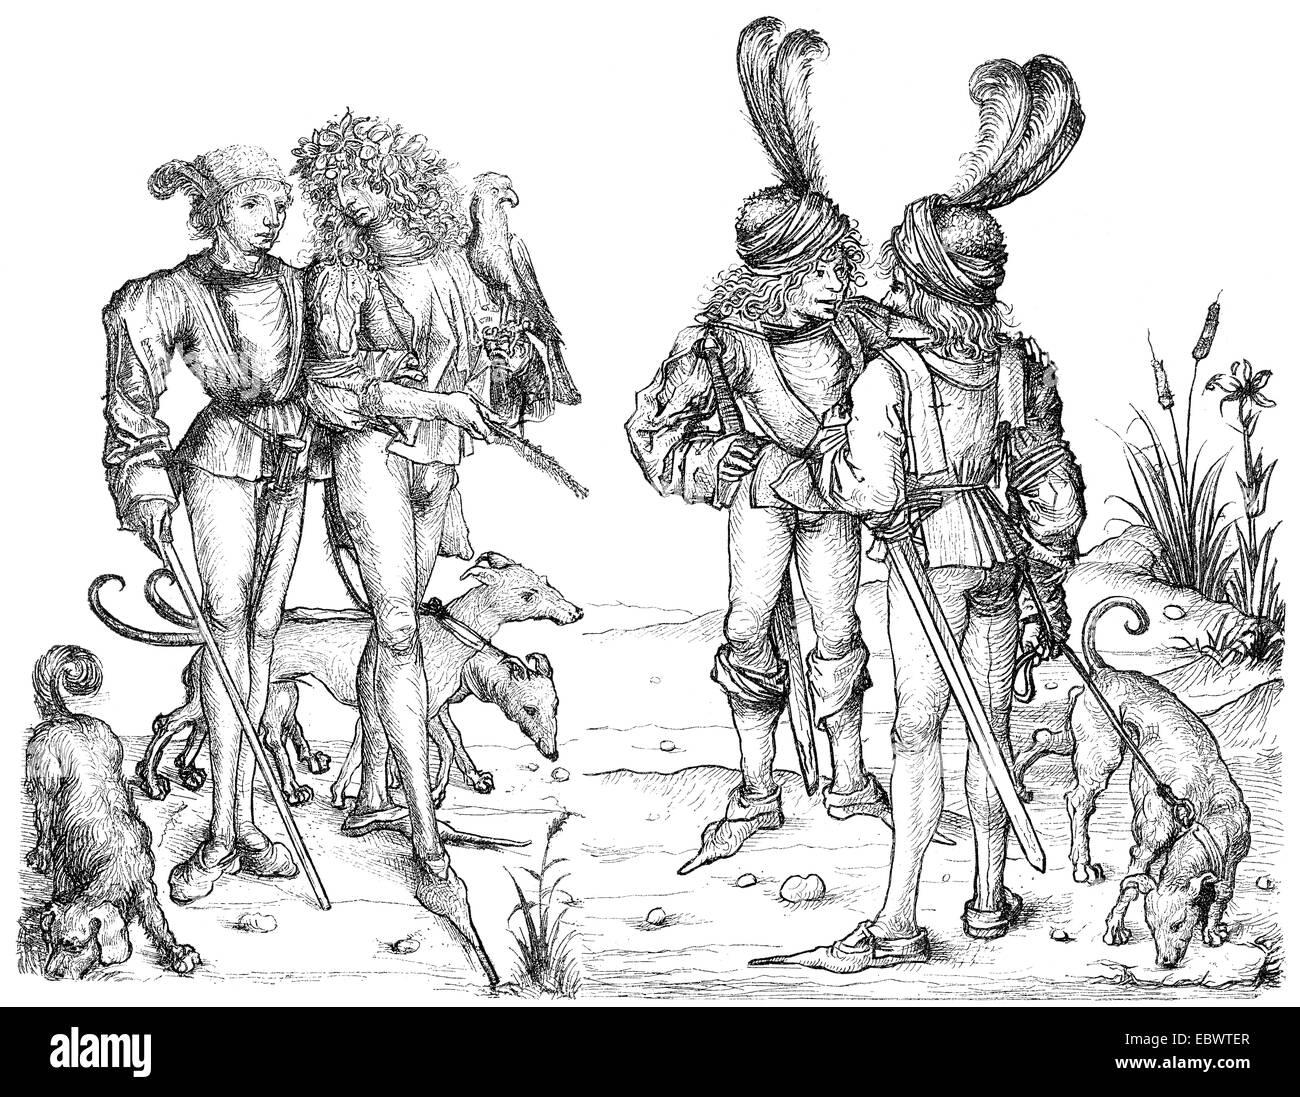 aristocratic costumes, 15th century, Mode von Aristokraten im  15. Jahrhundert - Stock Image